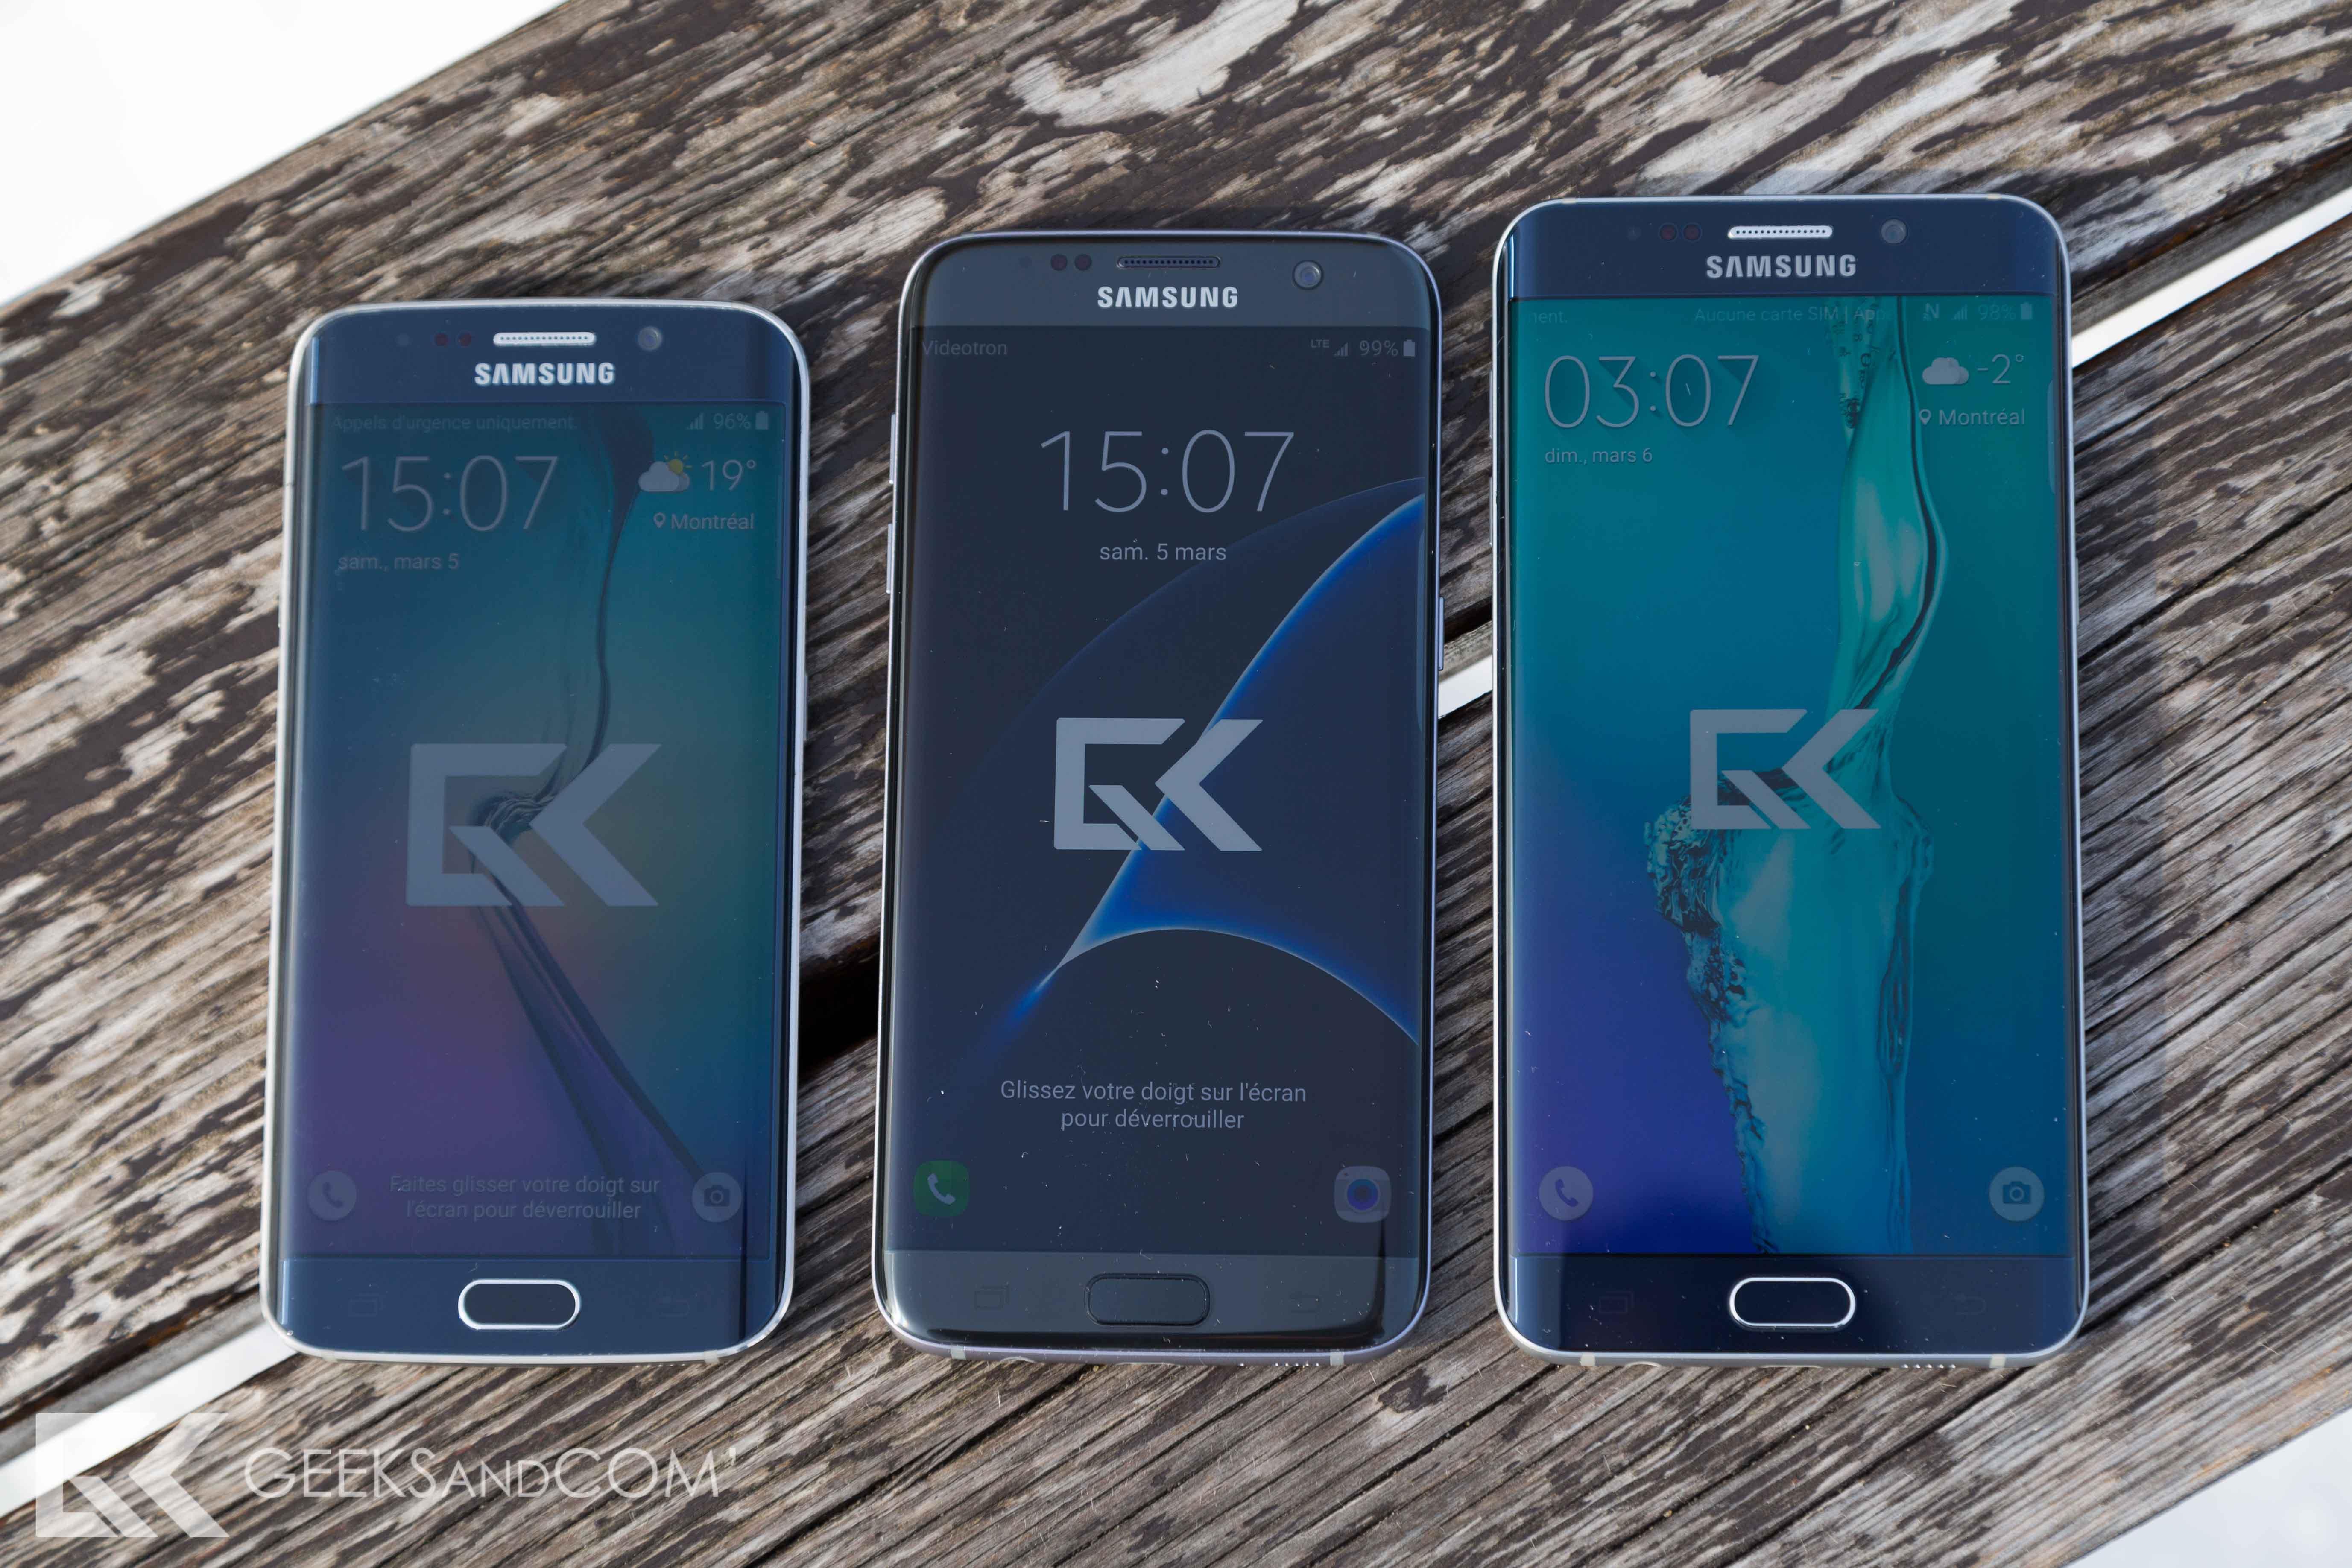 Samsung Galaxy S6 edge vs S7 edge vs S6 edge plus - Test Geeks and Com -1